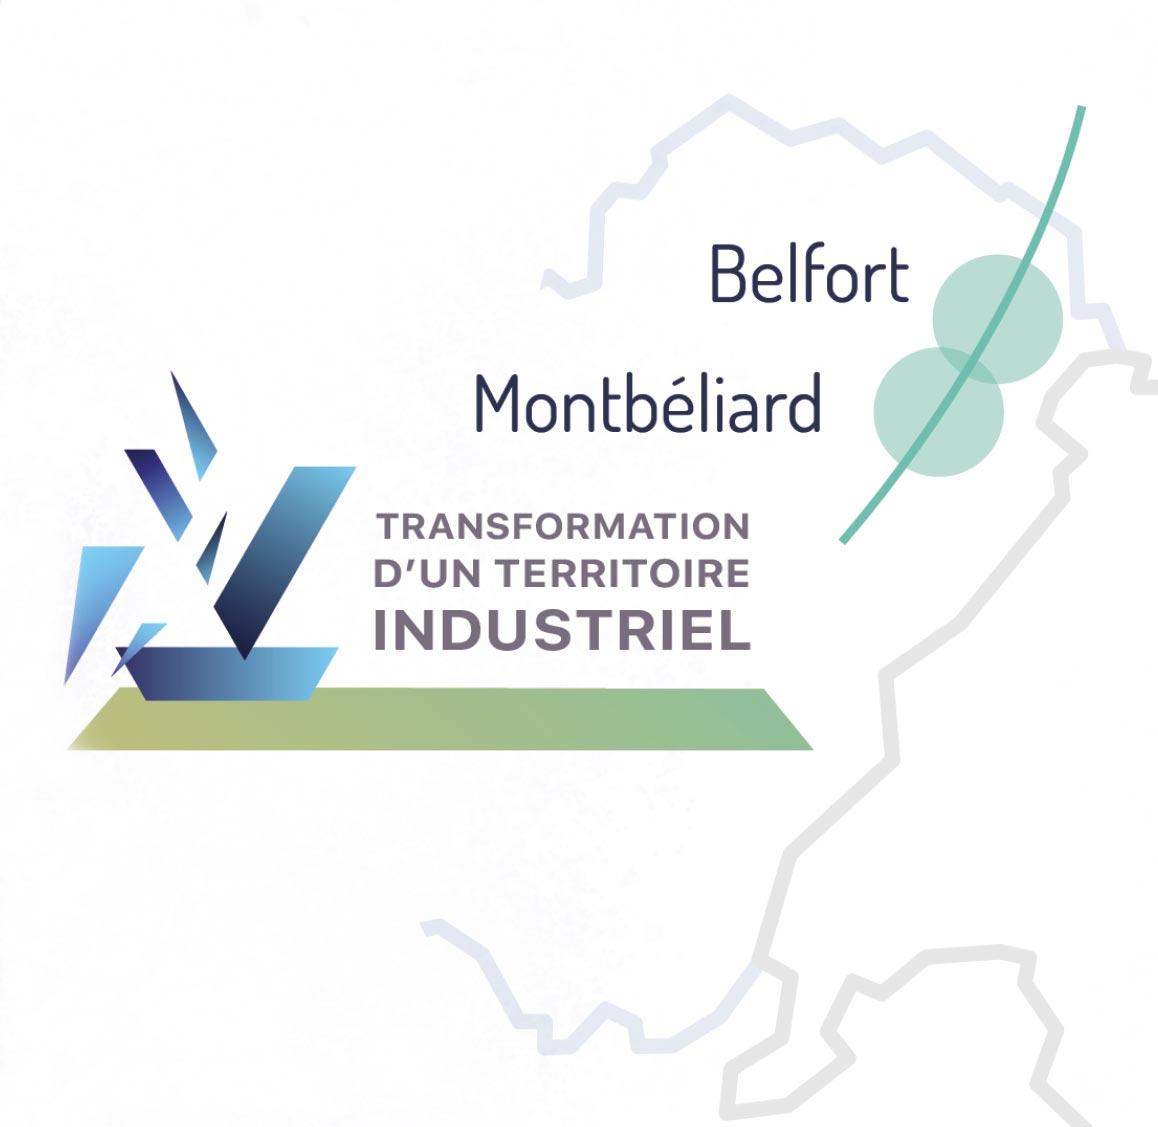 Transformation d'un territoire industriel